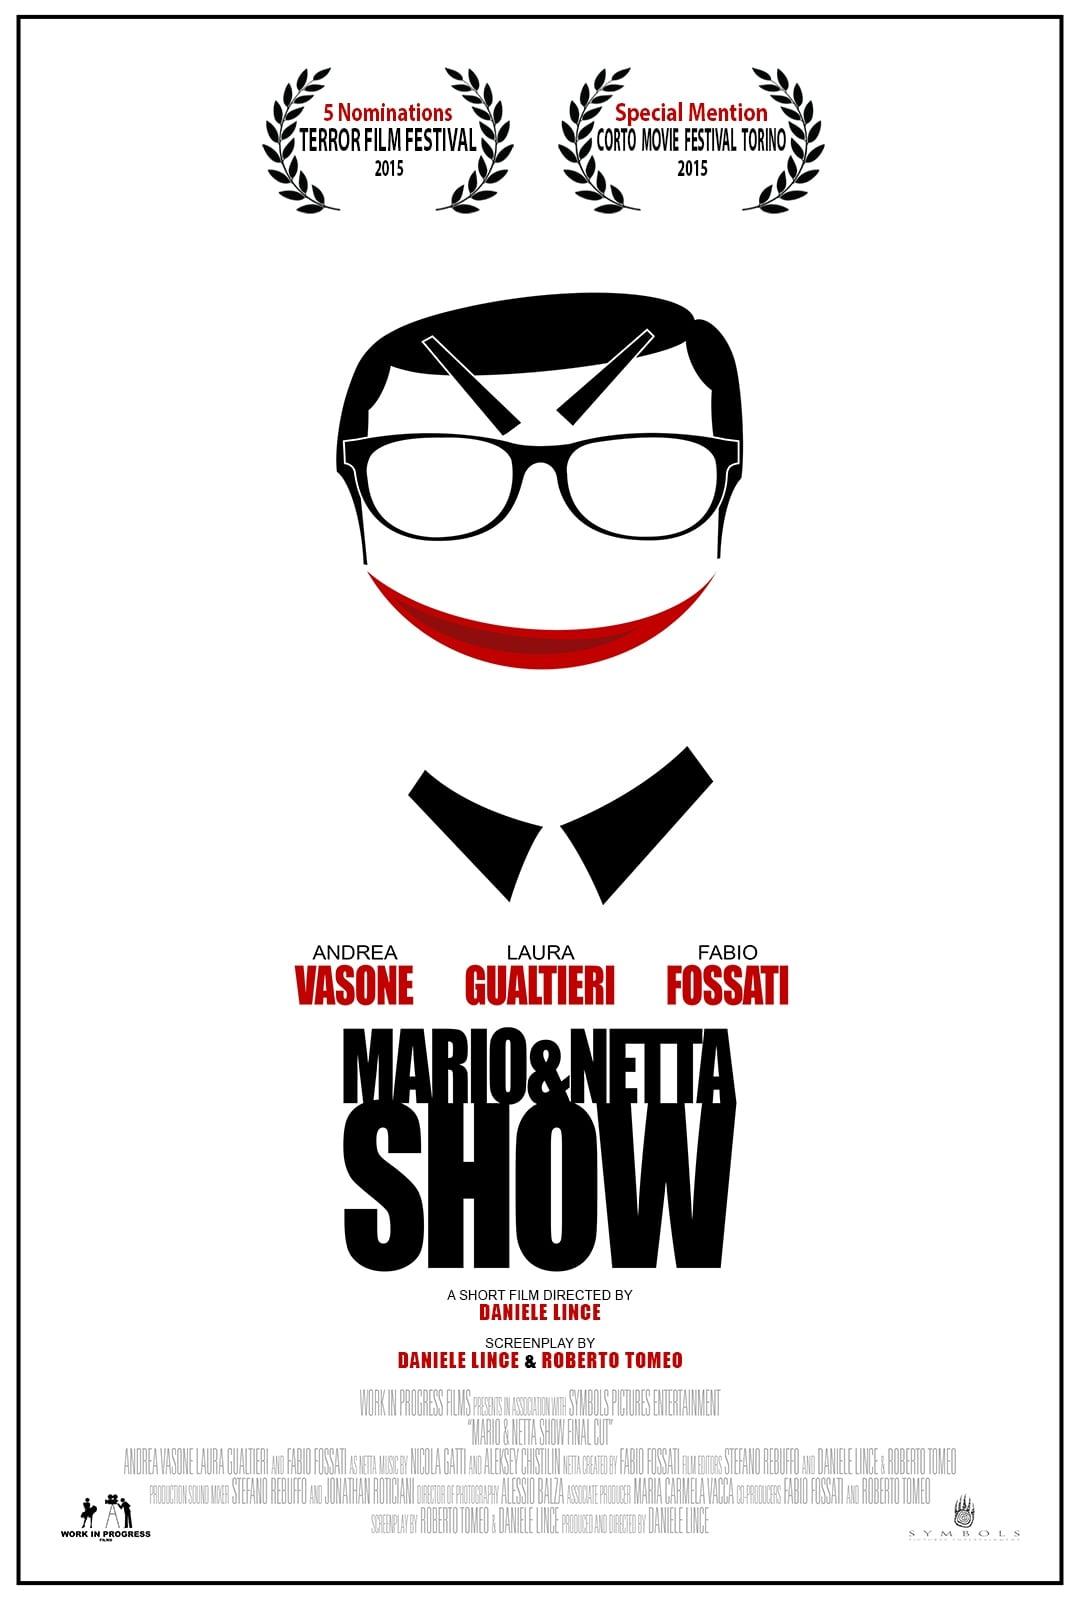 Mario & Netta Show